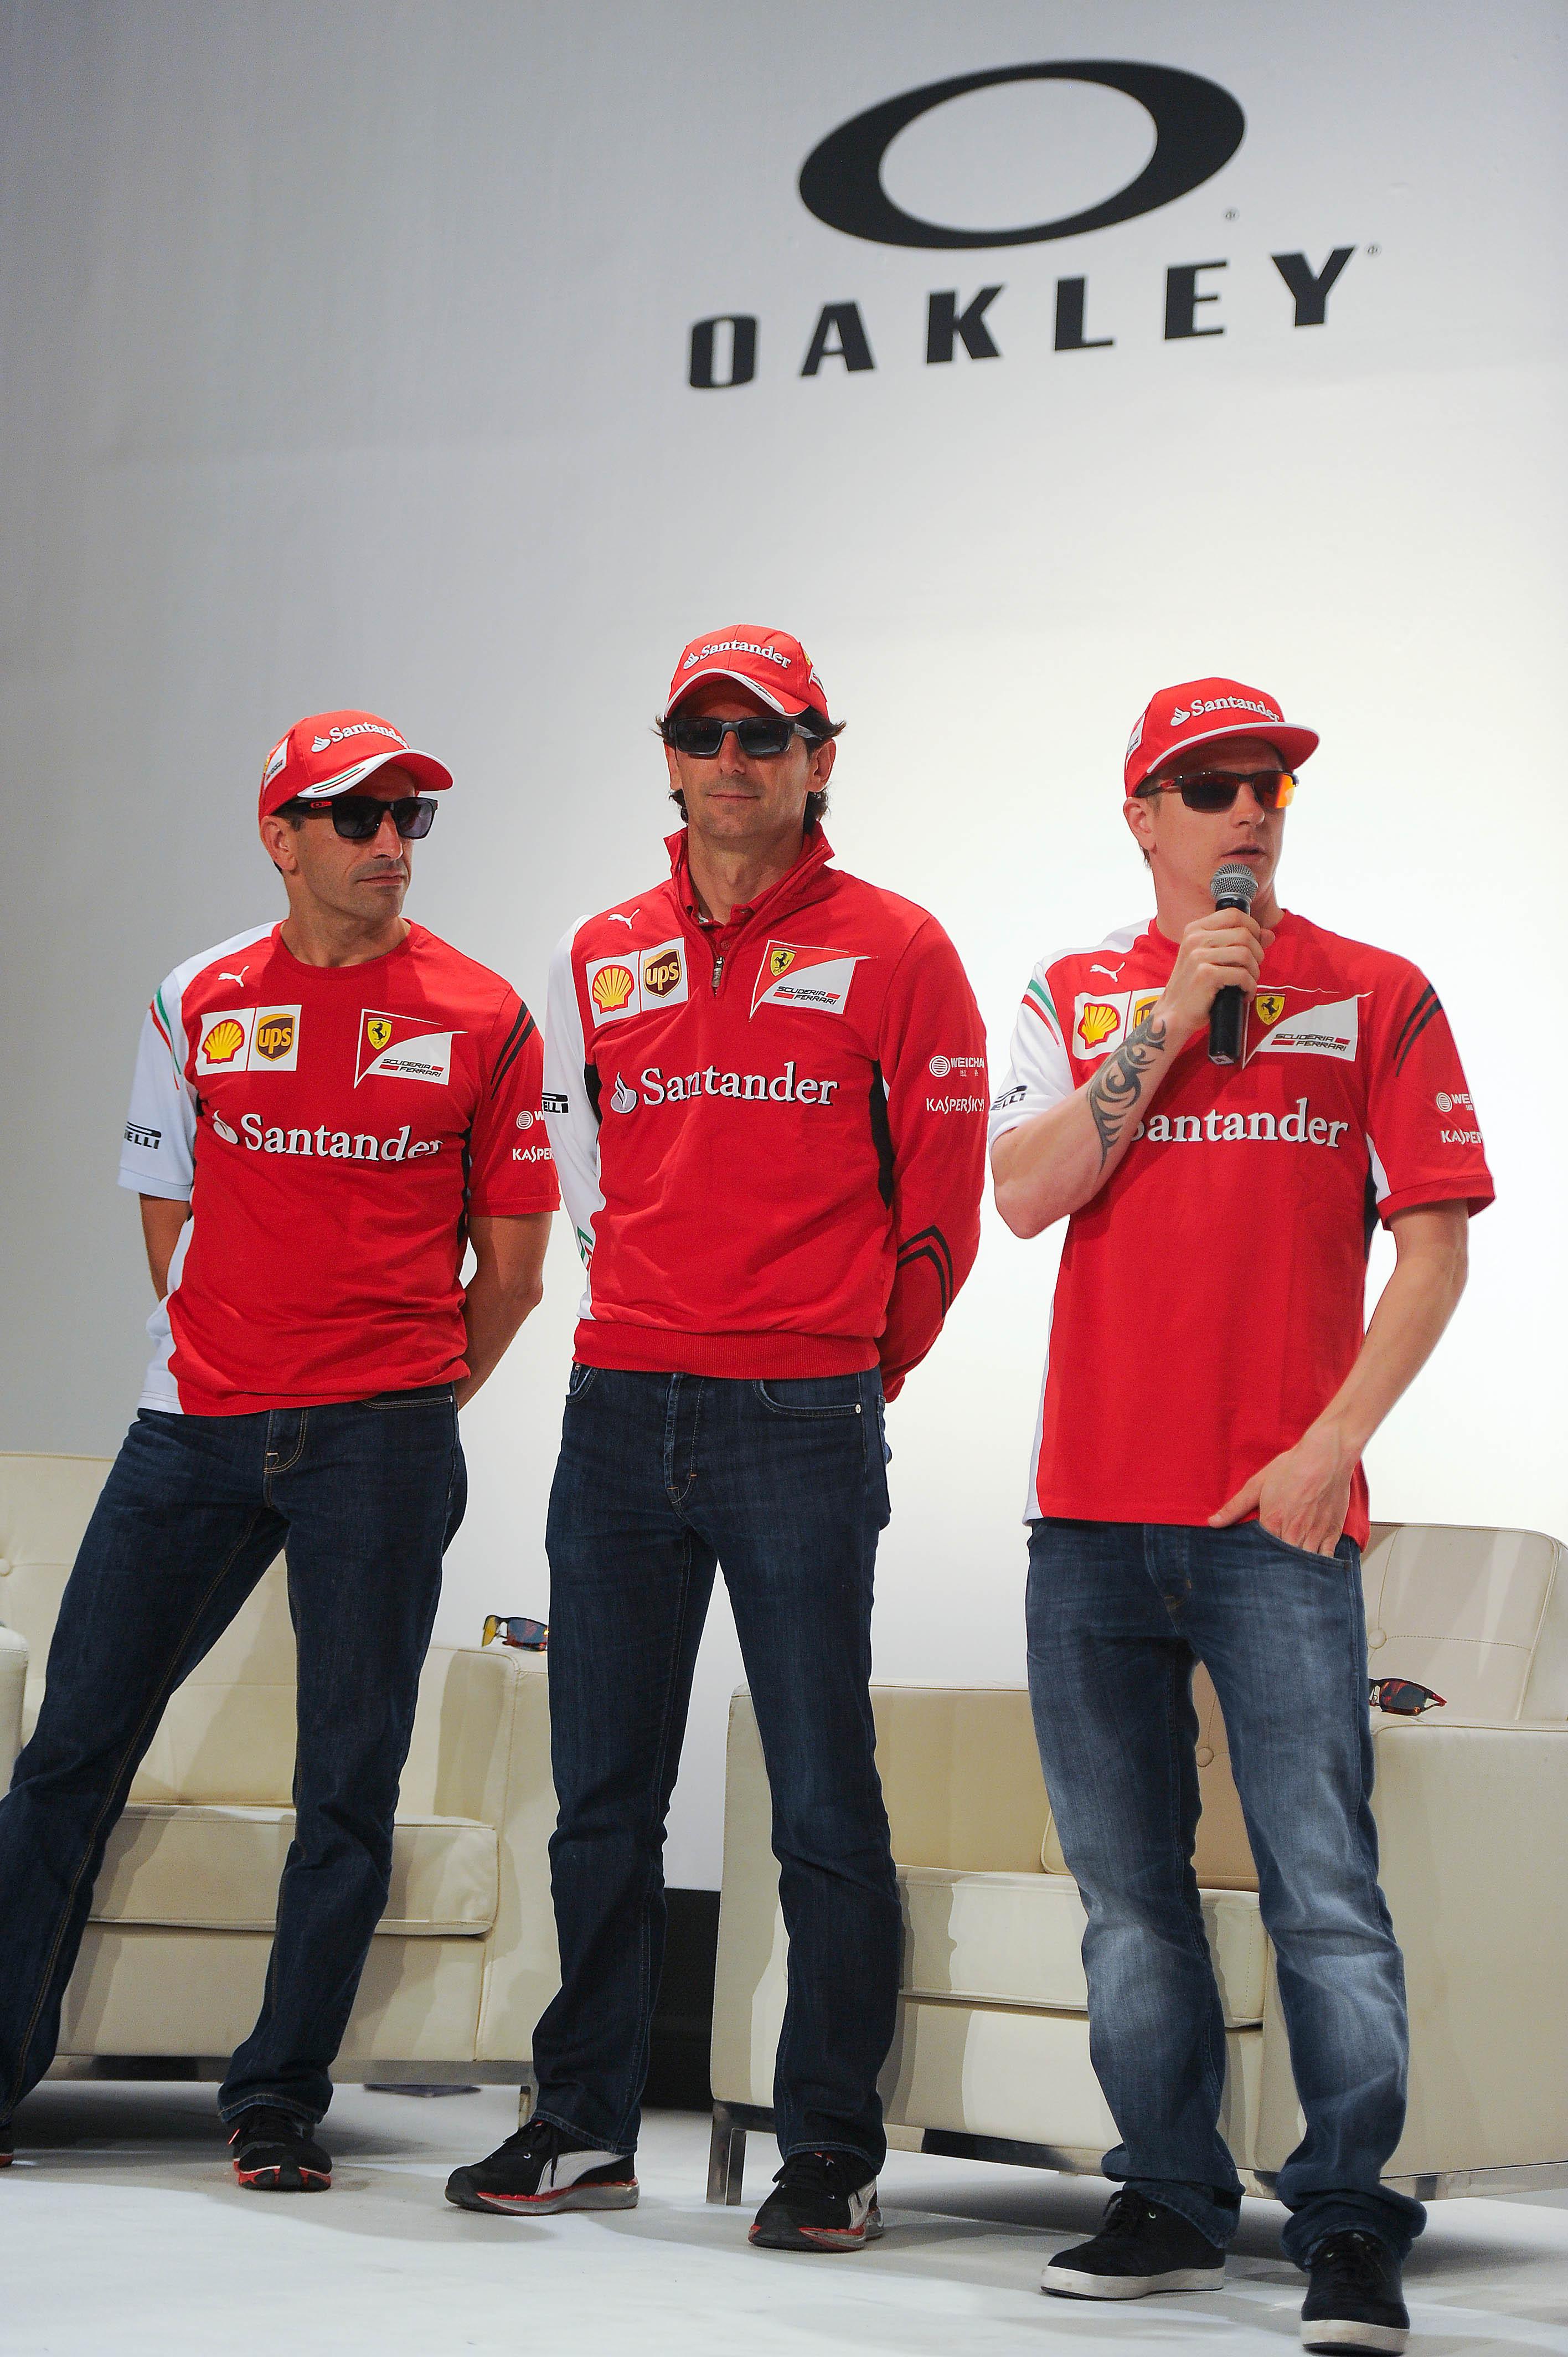 3a2b5a38143 Oakley Ignites Partnership with Scuderia Ferrari